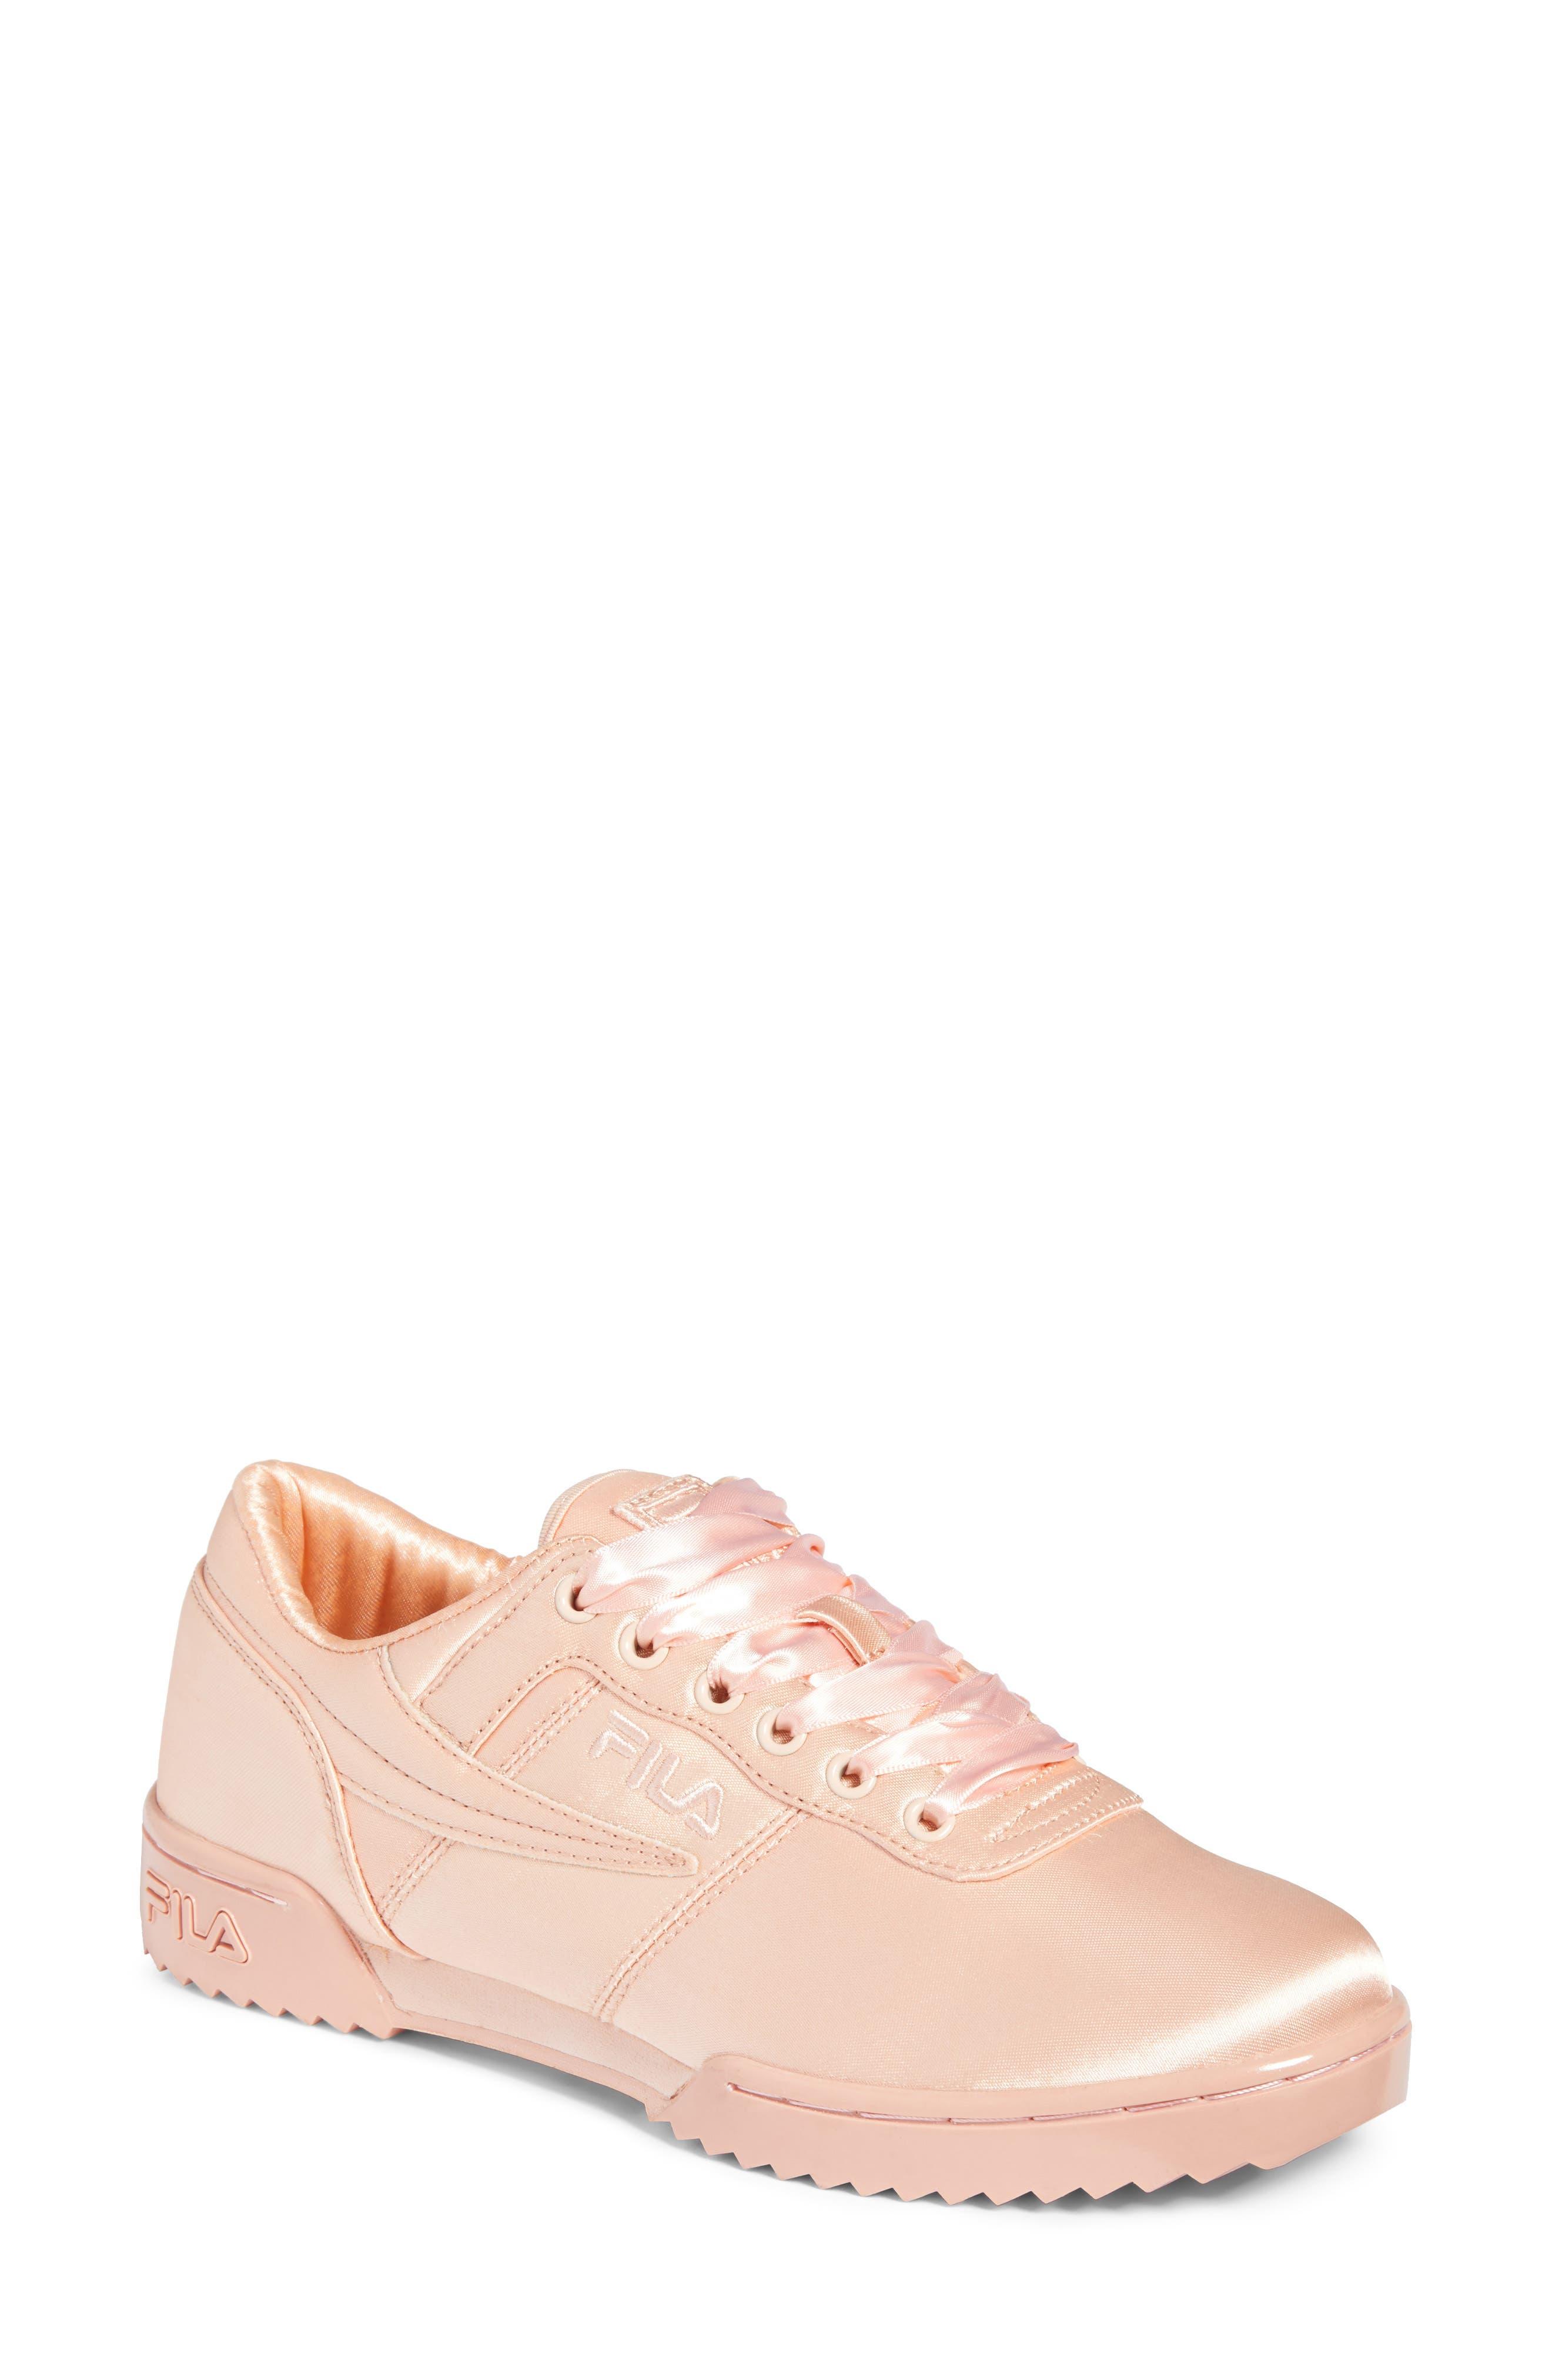 Original Fitness Ripple Satin Sneaker,                         Main,                         color, PINK